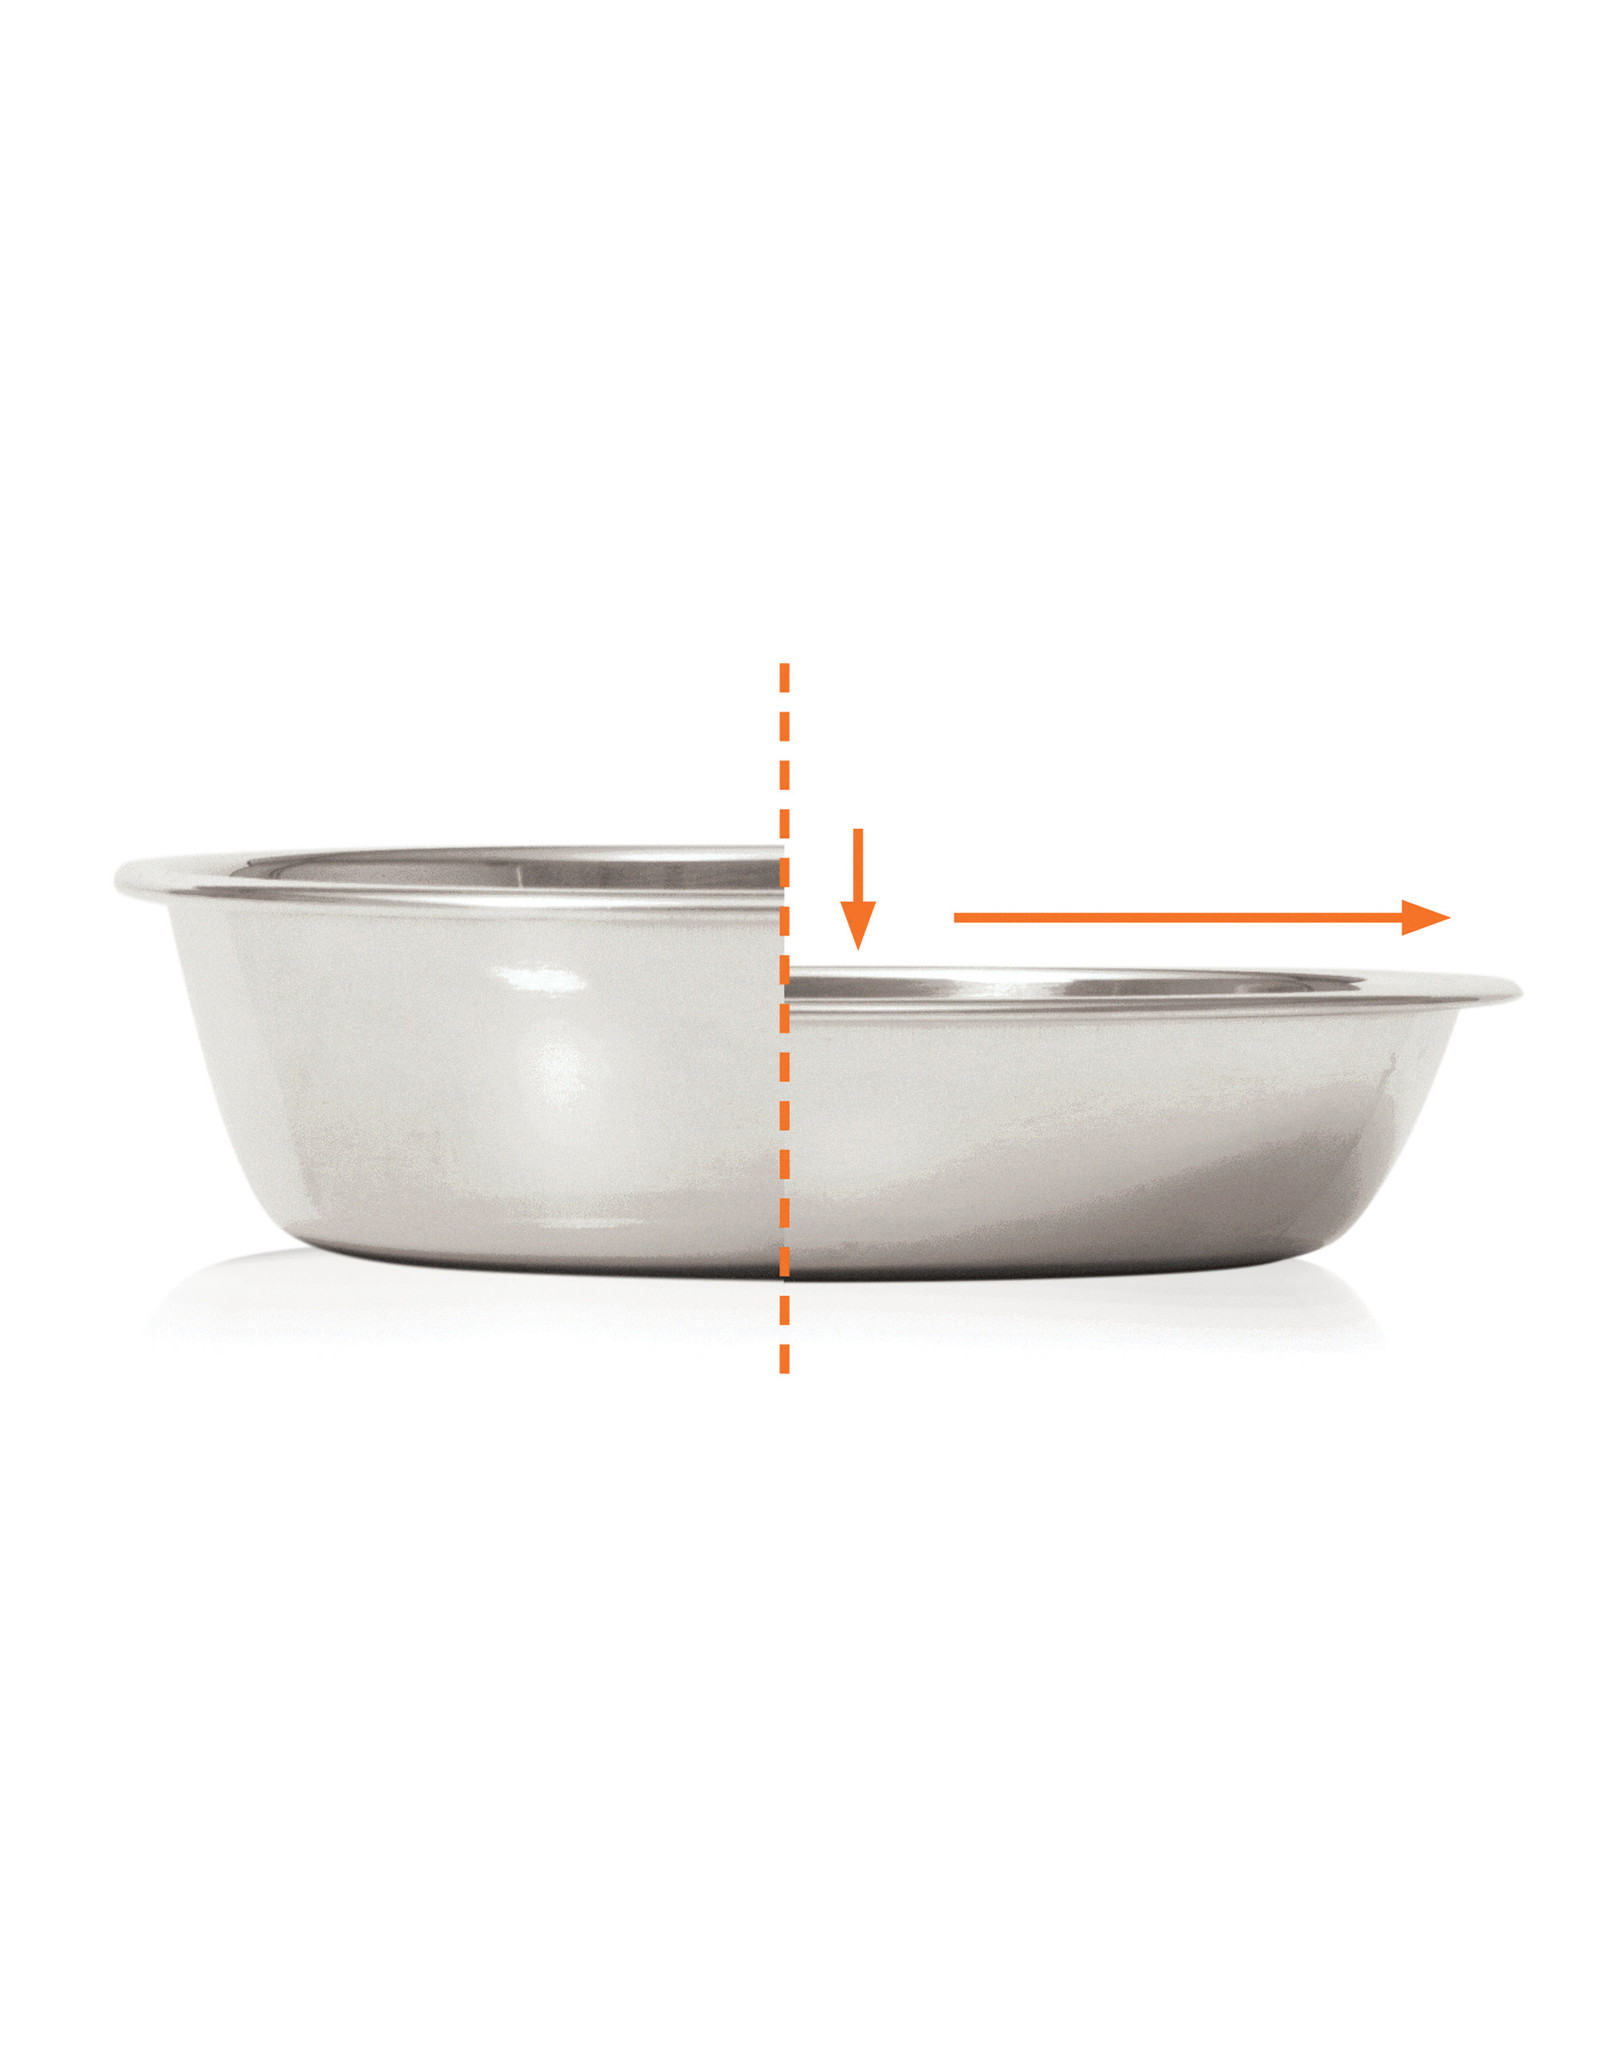 CT - Catit 2.0 Catit Feeding Double Dish - Black - 2 x 200 ml (6.83 fl oz)